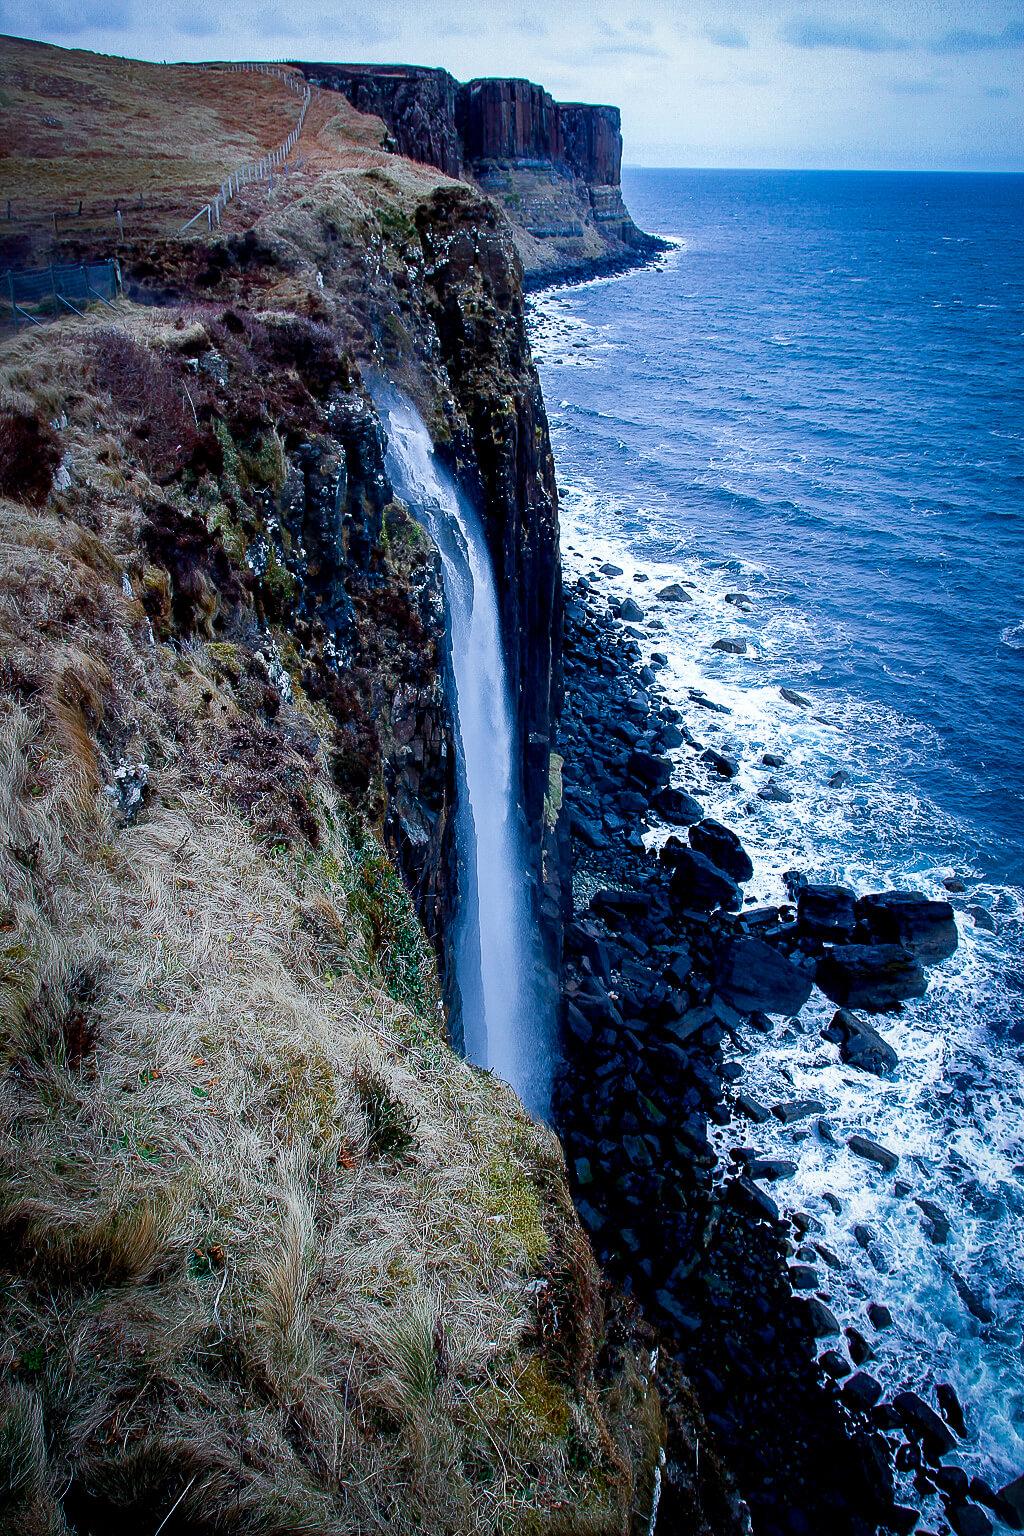 Isle of Skye Schottland Sehenswürdigkeiten Kilt Rock Waterfall Highlands tantedine